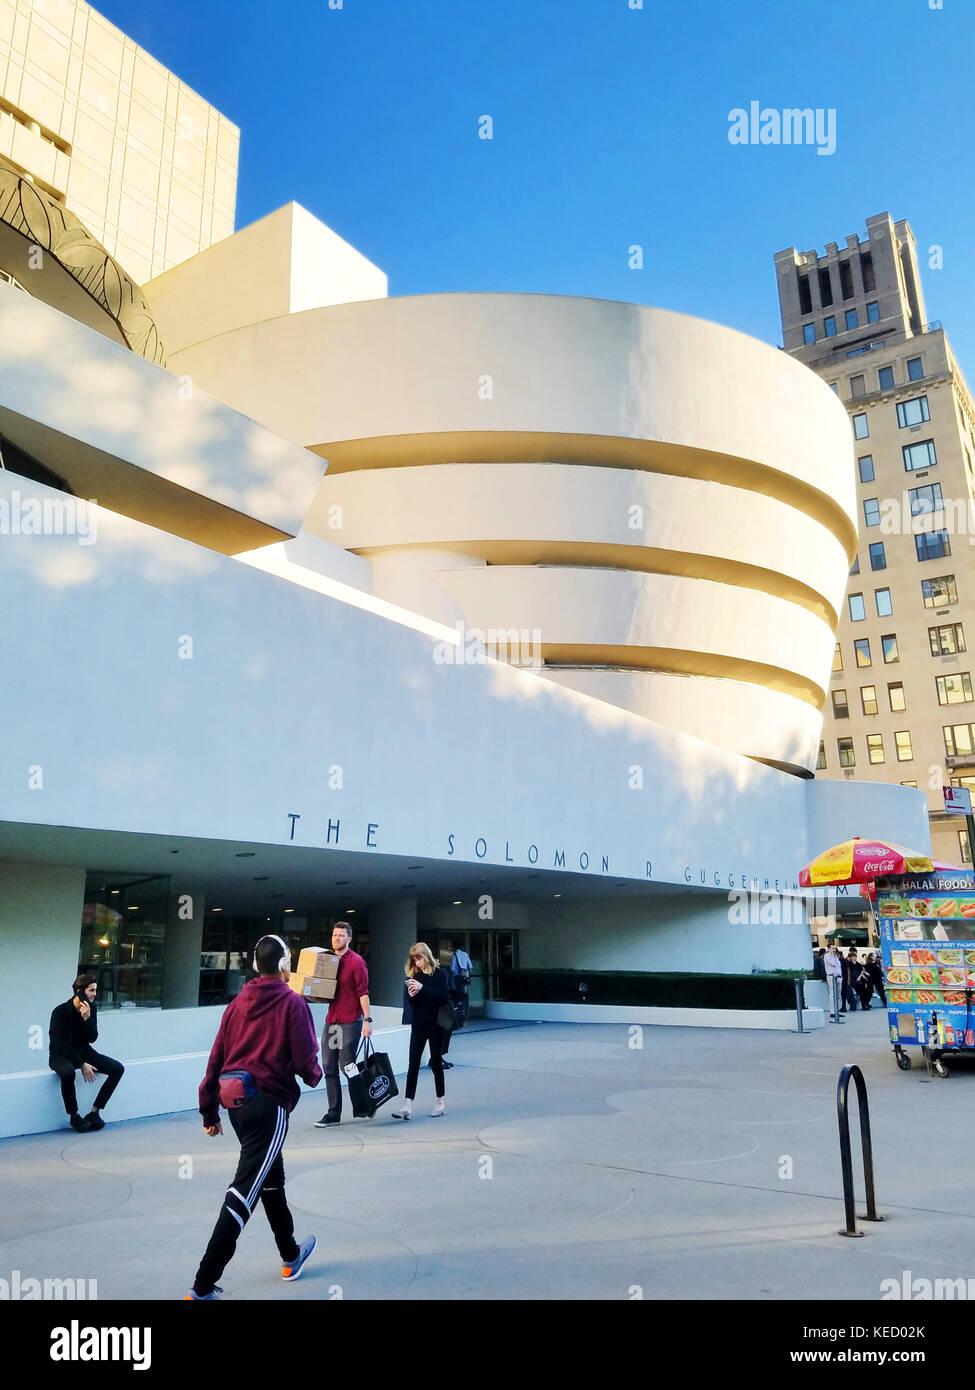 The Solomon R. Guggenheim Museum, New York City - Stock Image